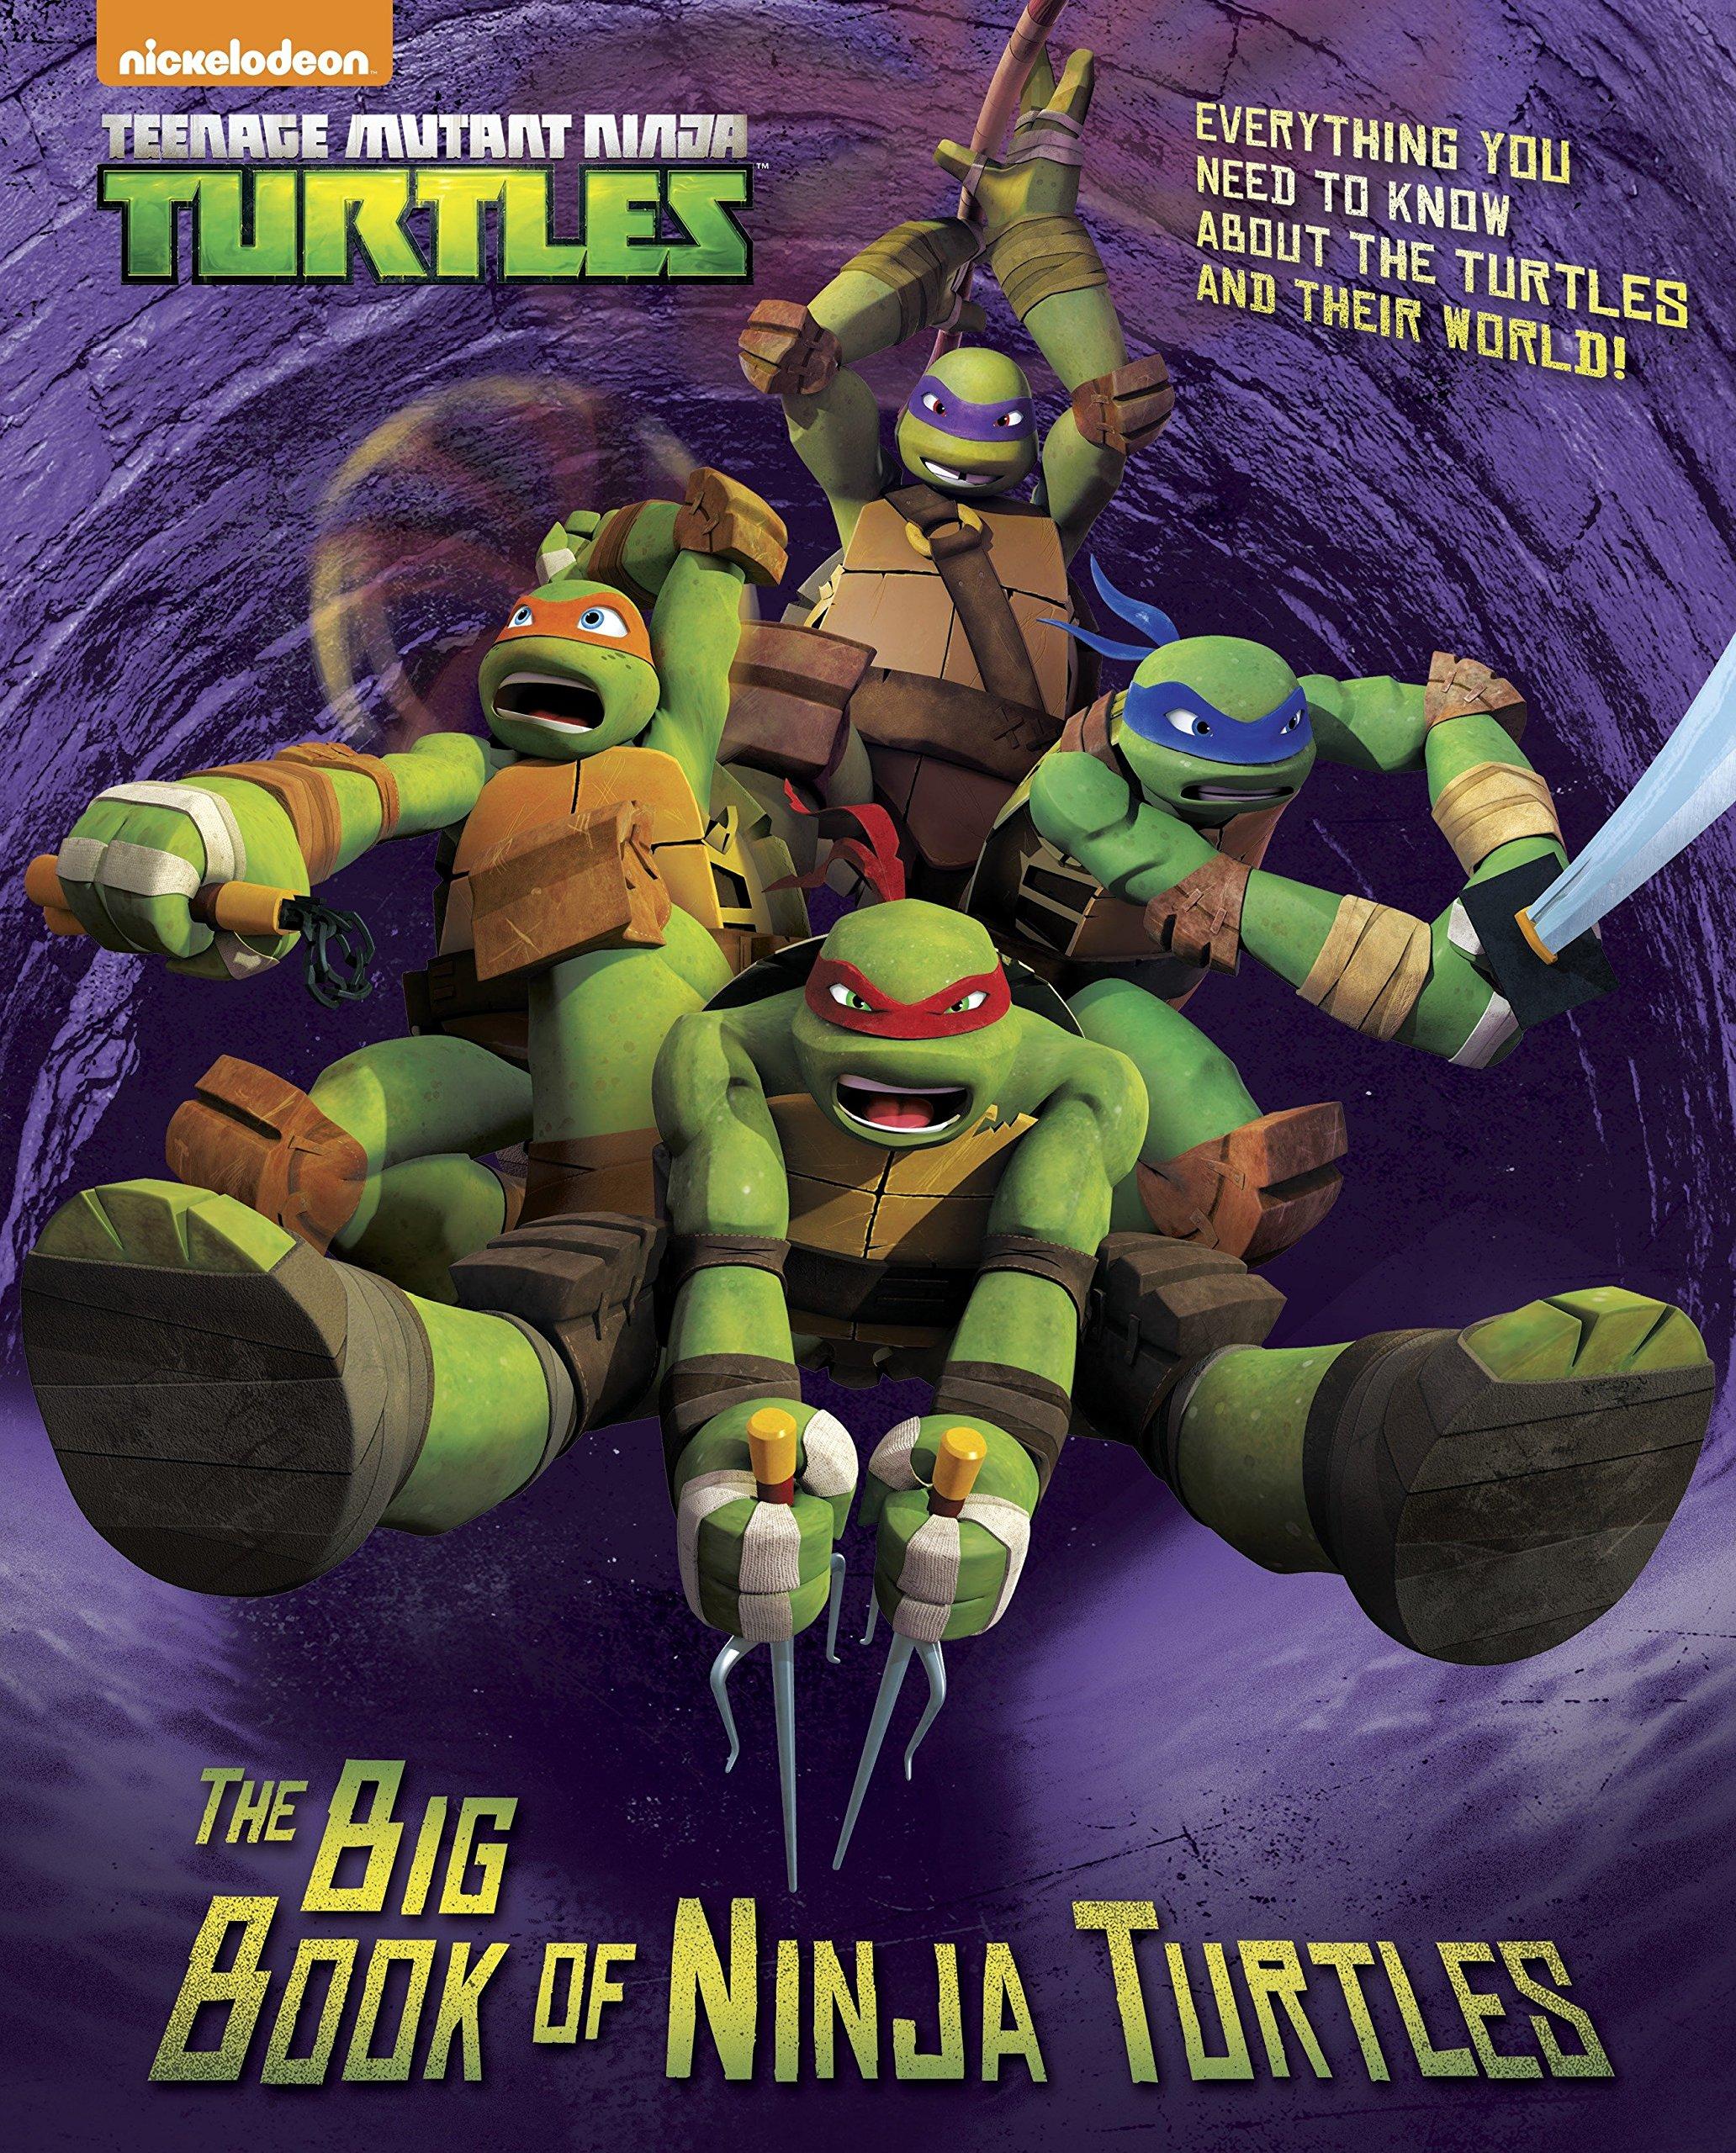 The Big Book of Ninja Turtles Big Golden Book: Teenage ...